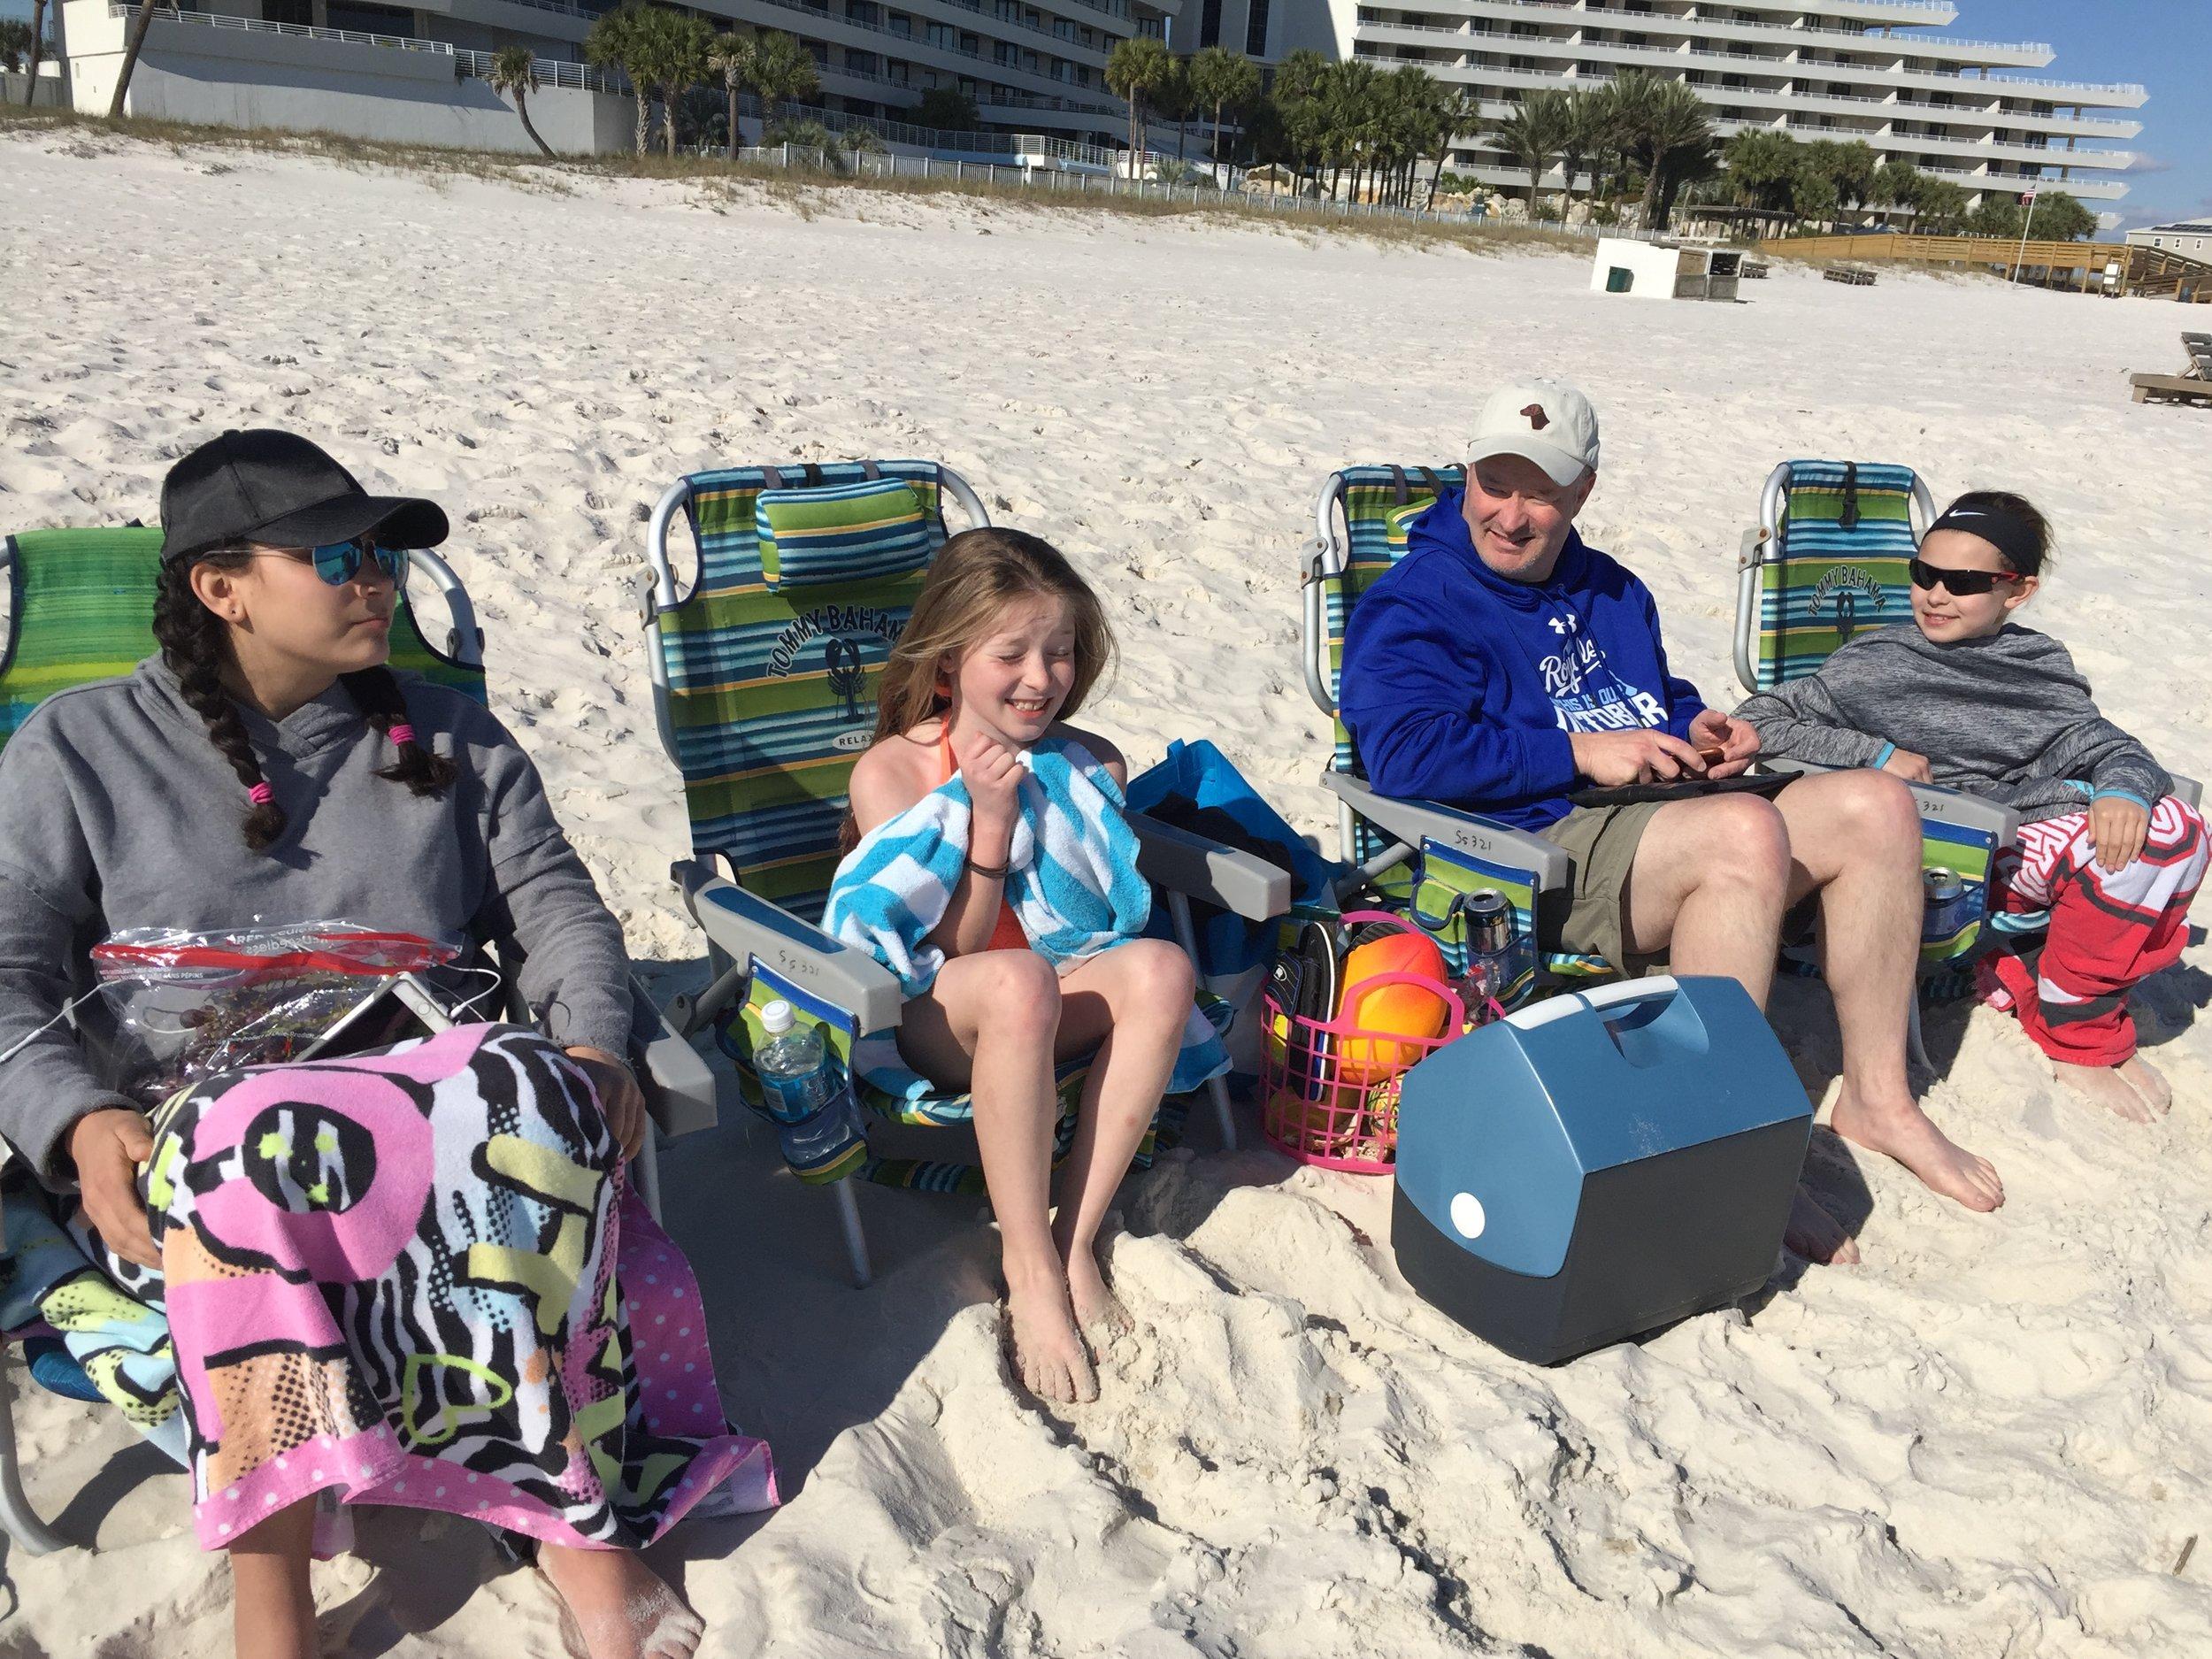 Kids and Pat on beach.JPG